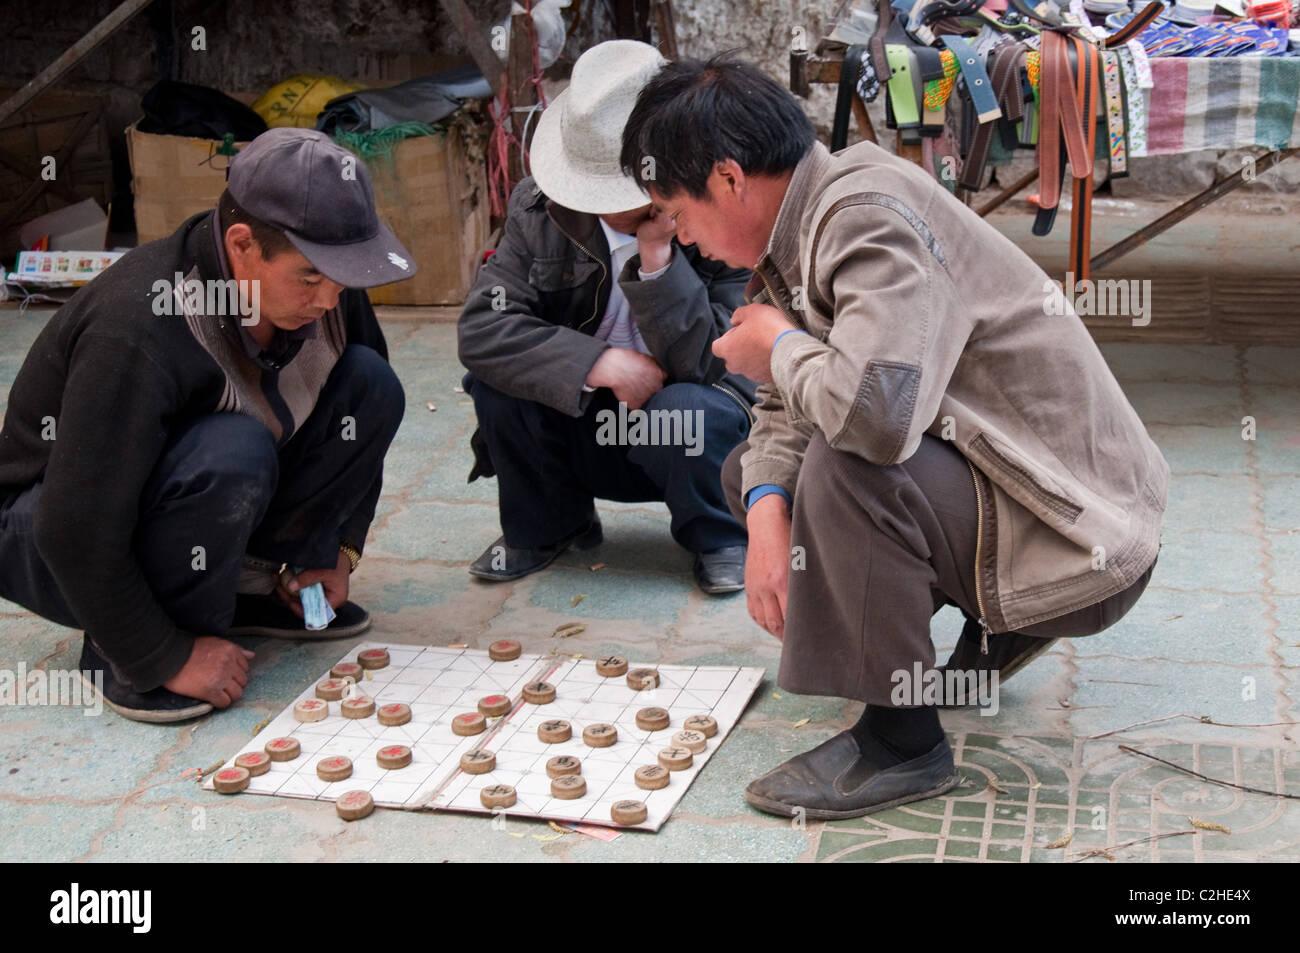 Chinese men playing Xiangqi, or Chinese Chess at Shigatse, TIbet - Stock Image